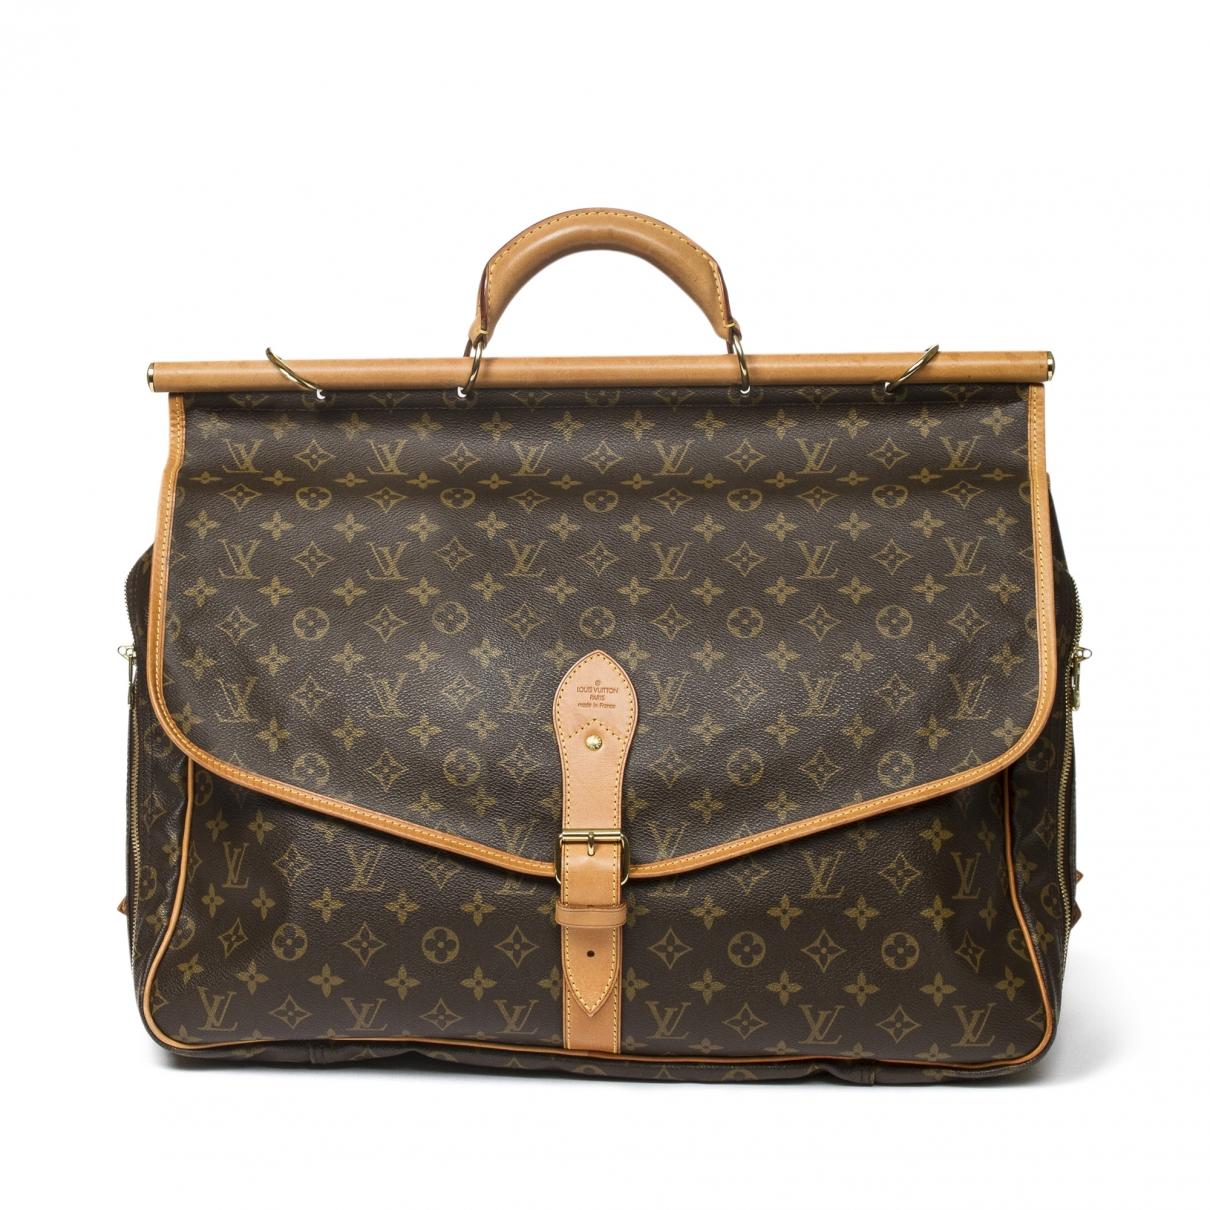 Bolso de viaje Chasse de Lona Louis Vuitton